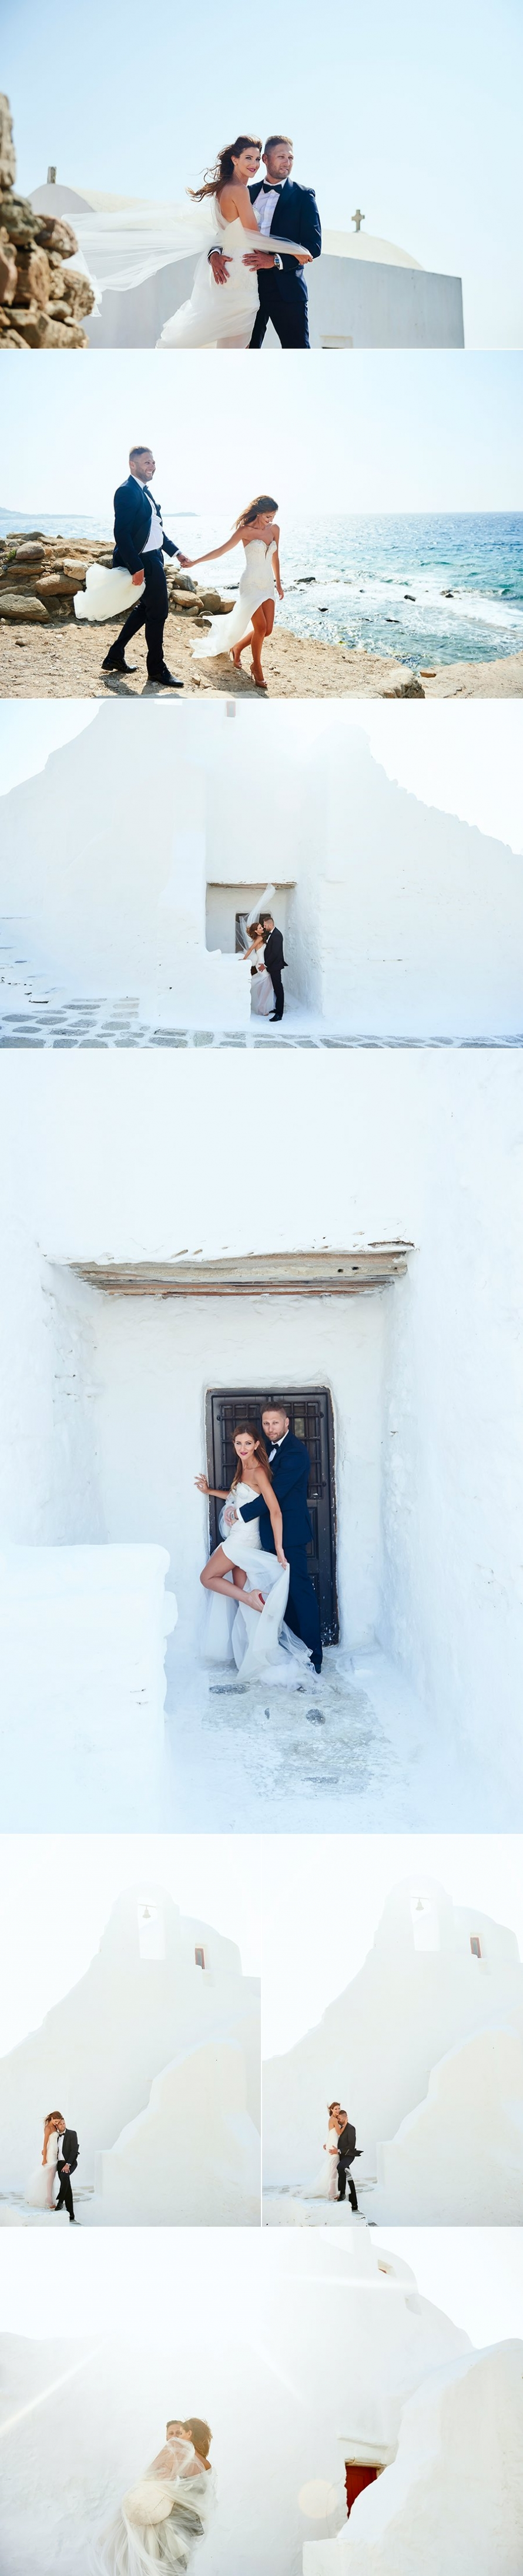 Gragan Gloria wedding photo 06